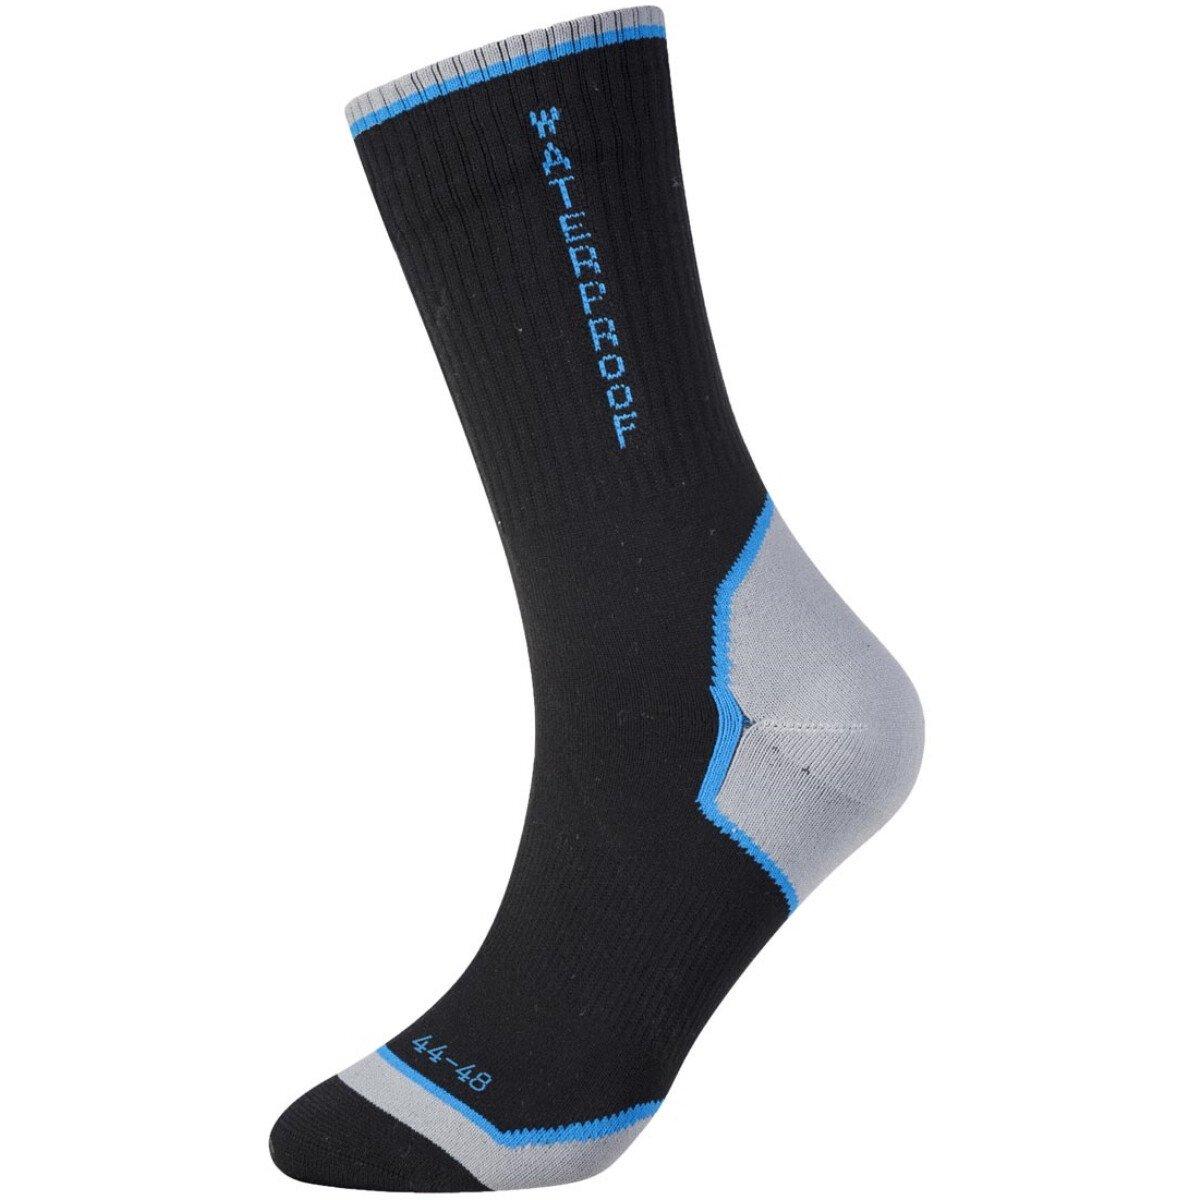 Portwest SK23 Black Size 10 - Size 13 (EU44 - EU48) Performance Waterproof Socks